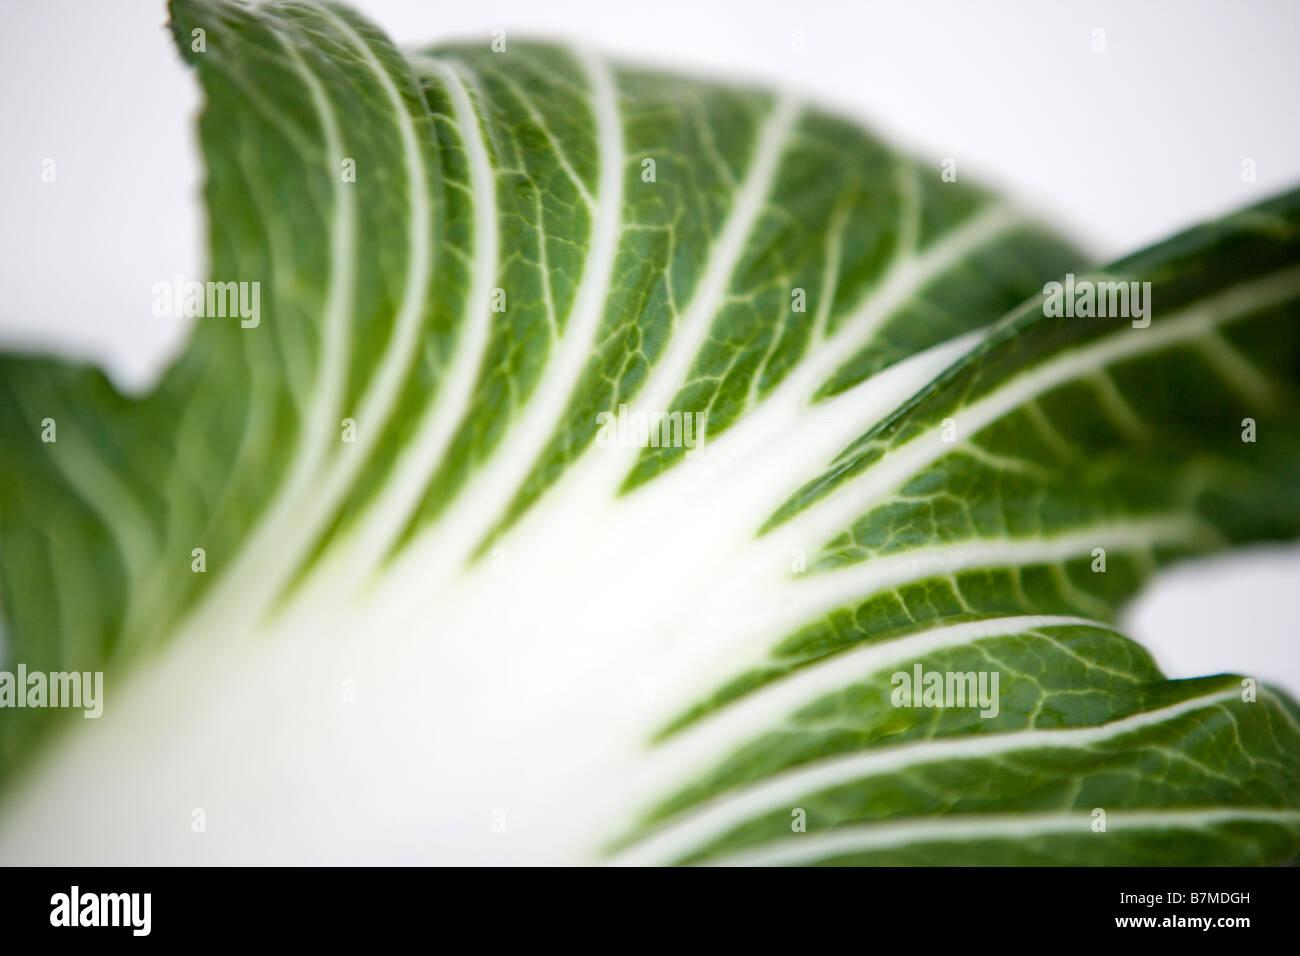 one leaf of fresh bok choy bok choi chinese cabbage - Stock Image